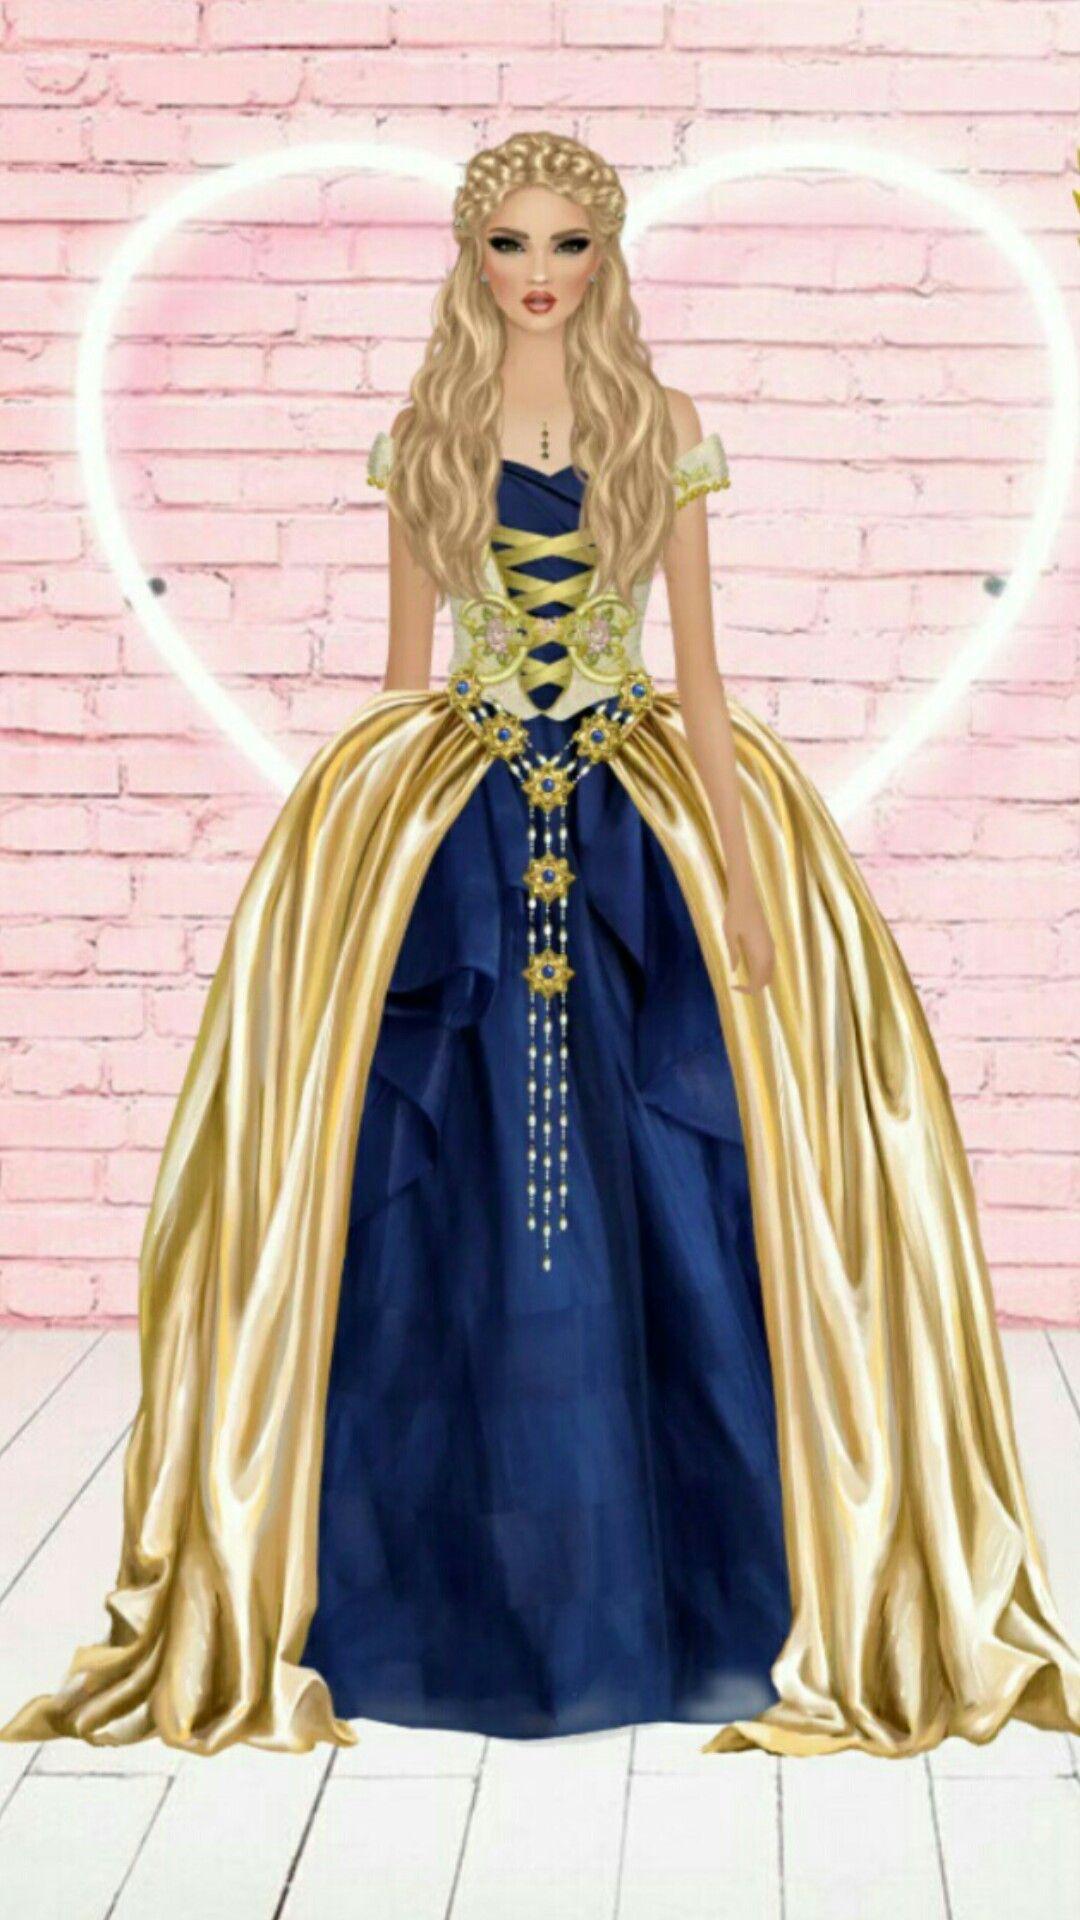 Pin by Dianne Harper on ° Covet fashion° Covet fashion